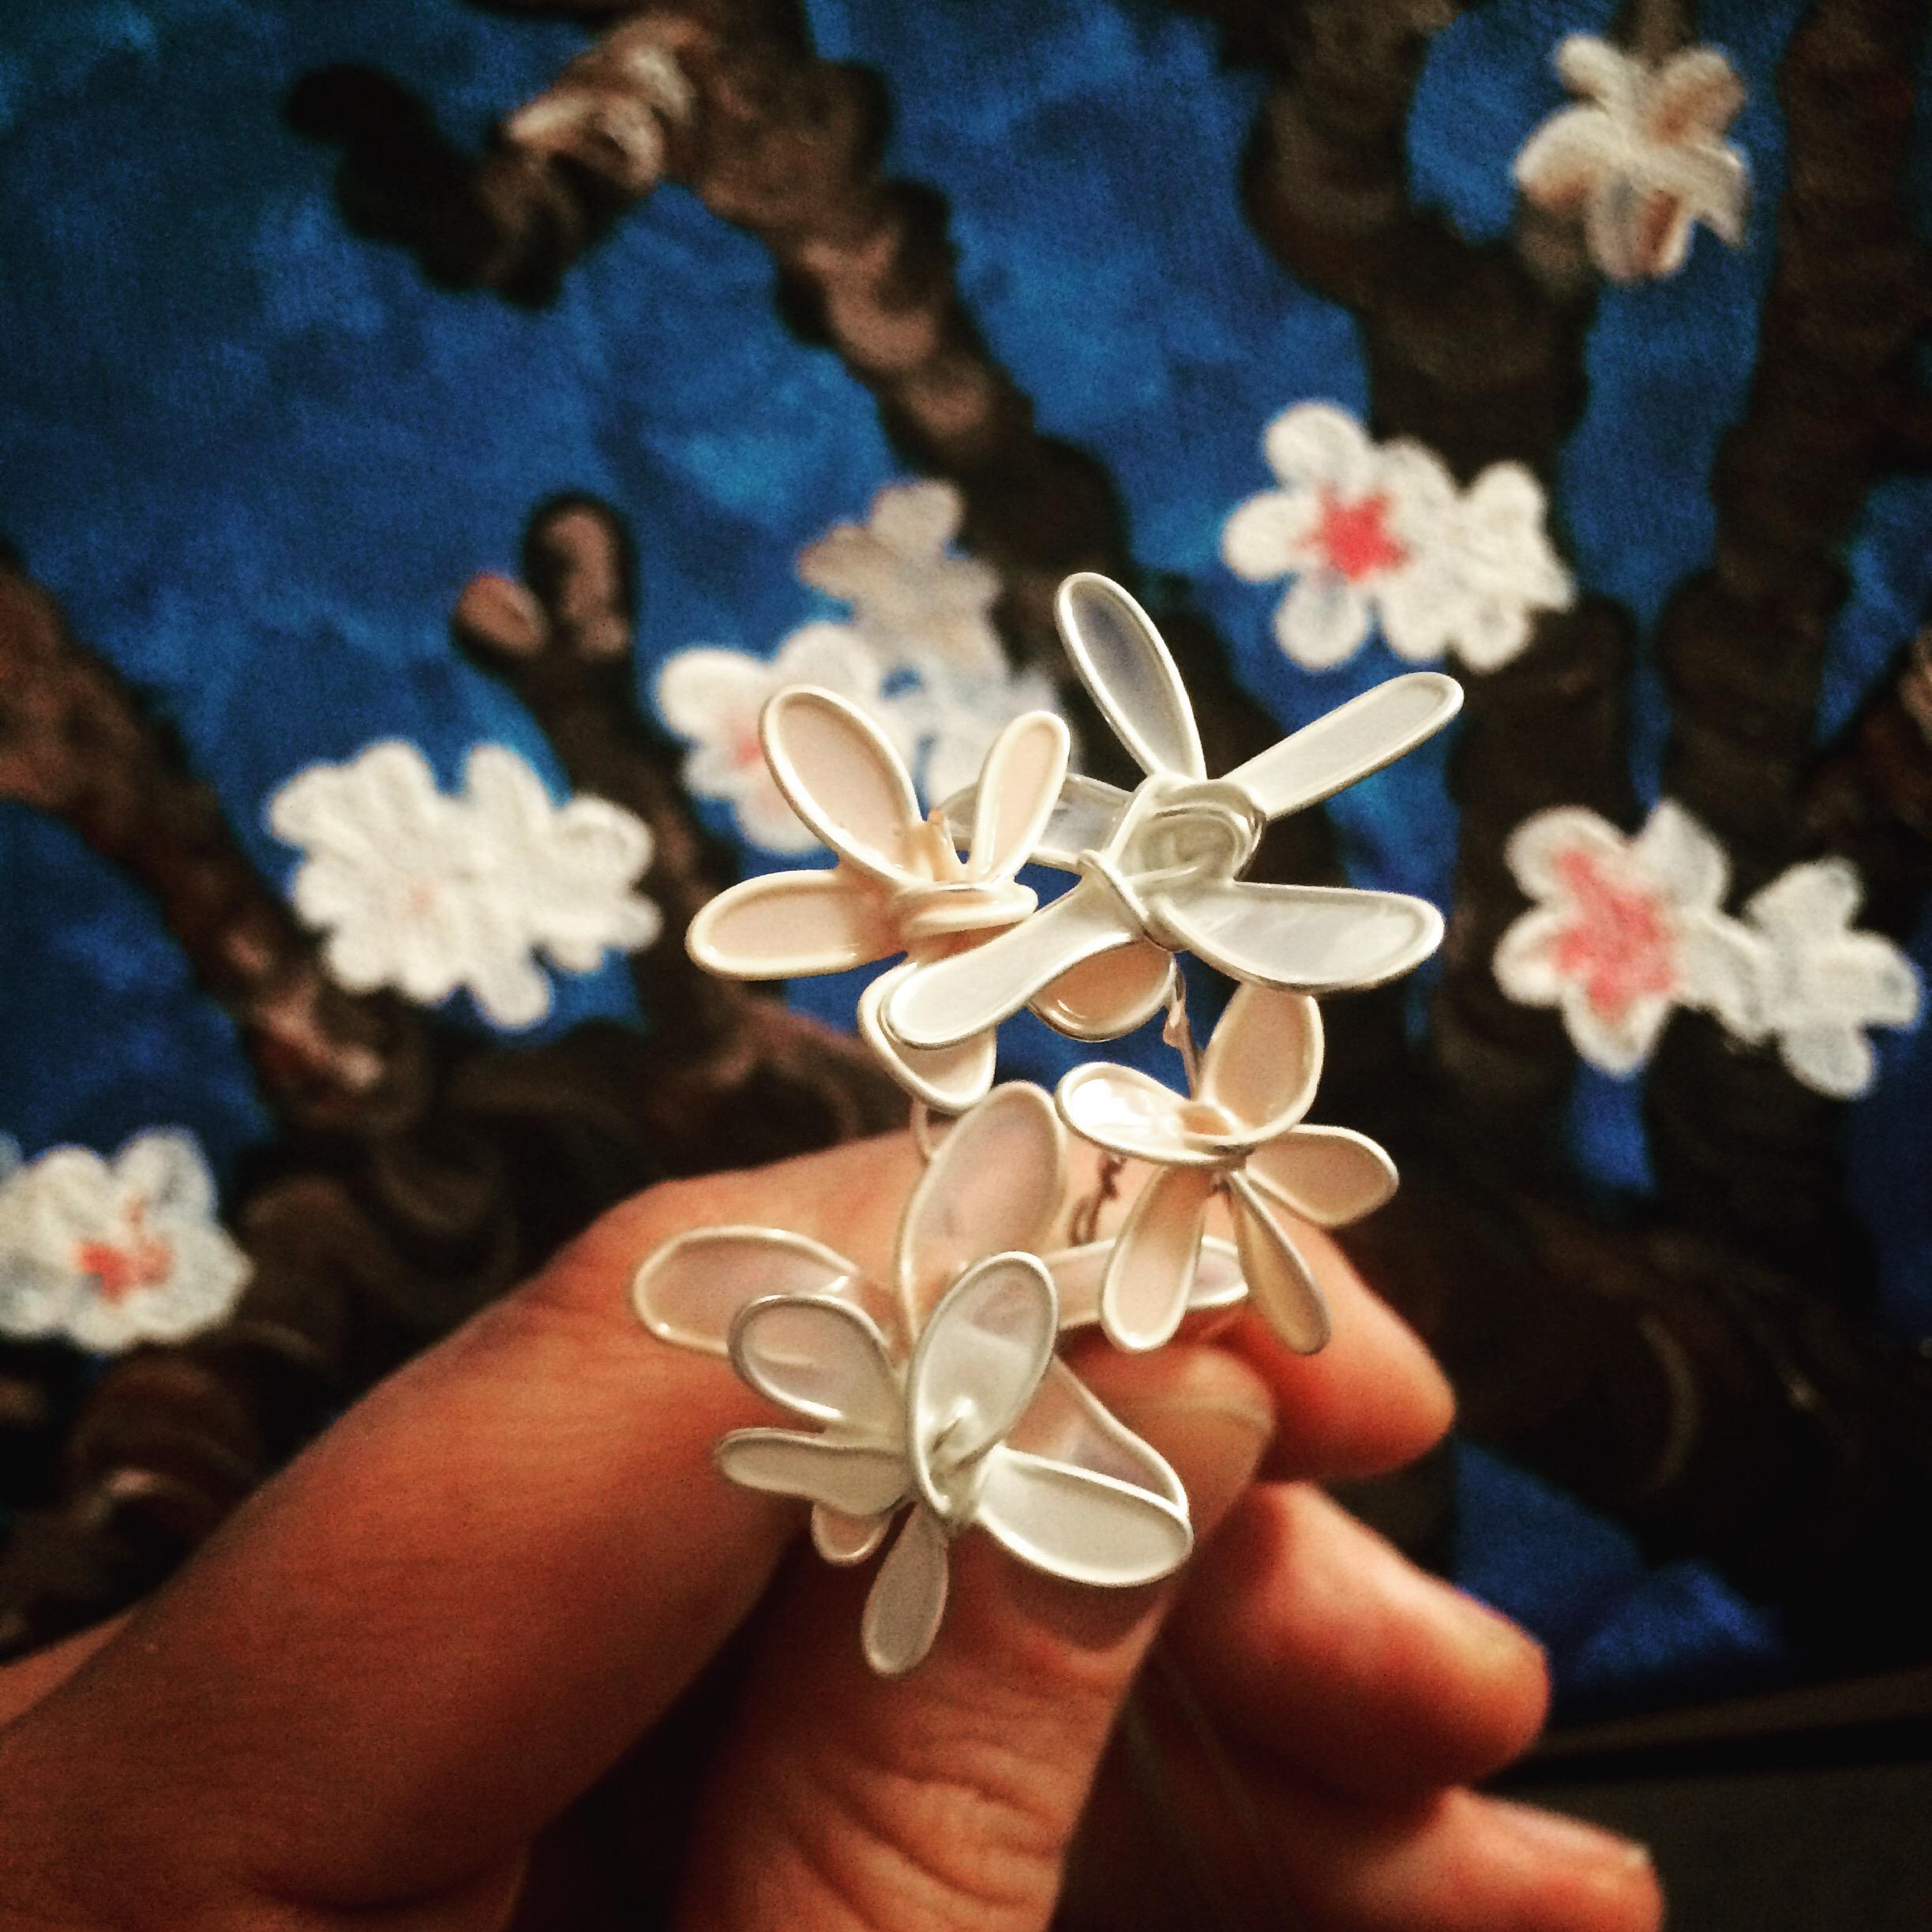 Making nailpolish flowers